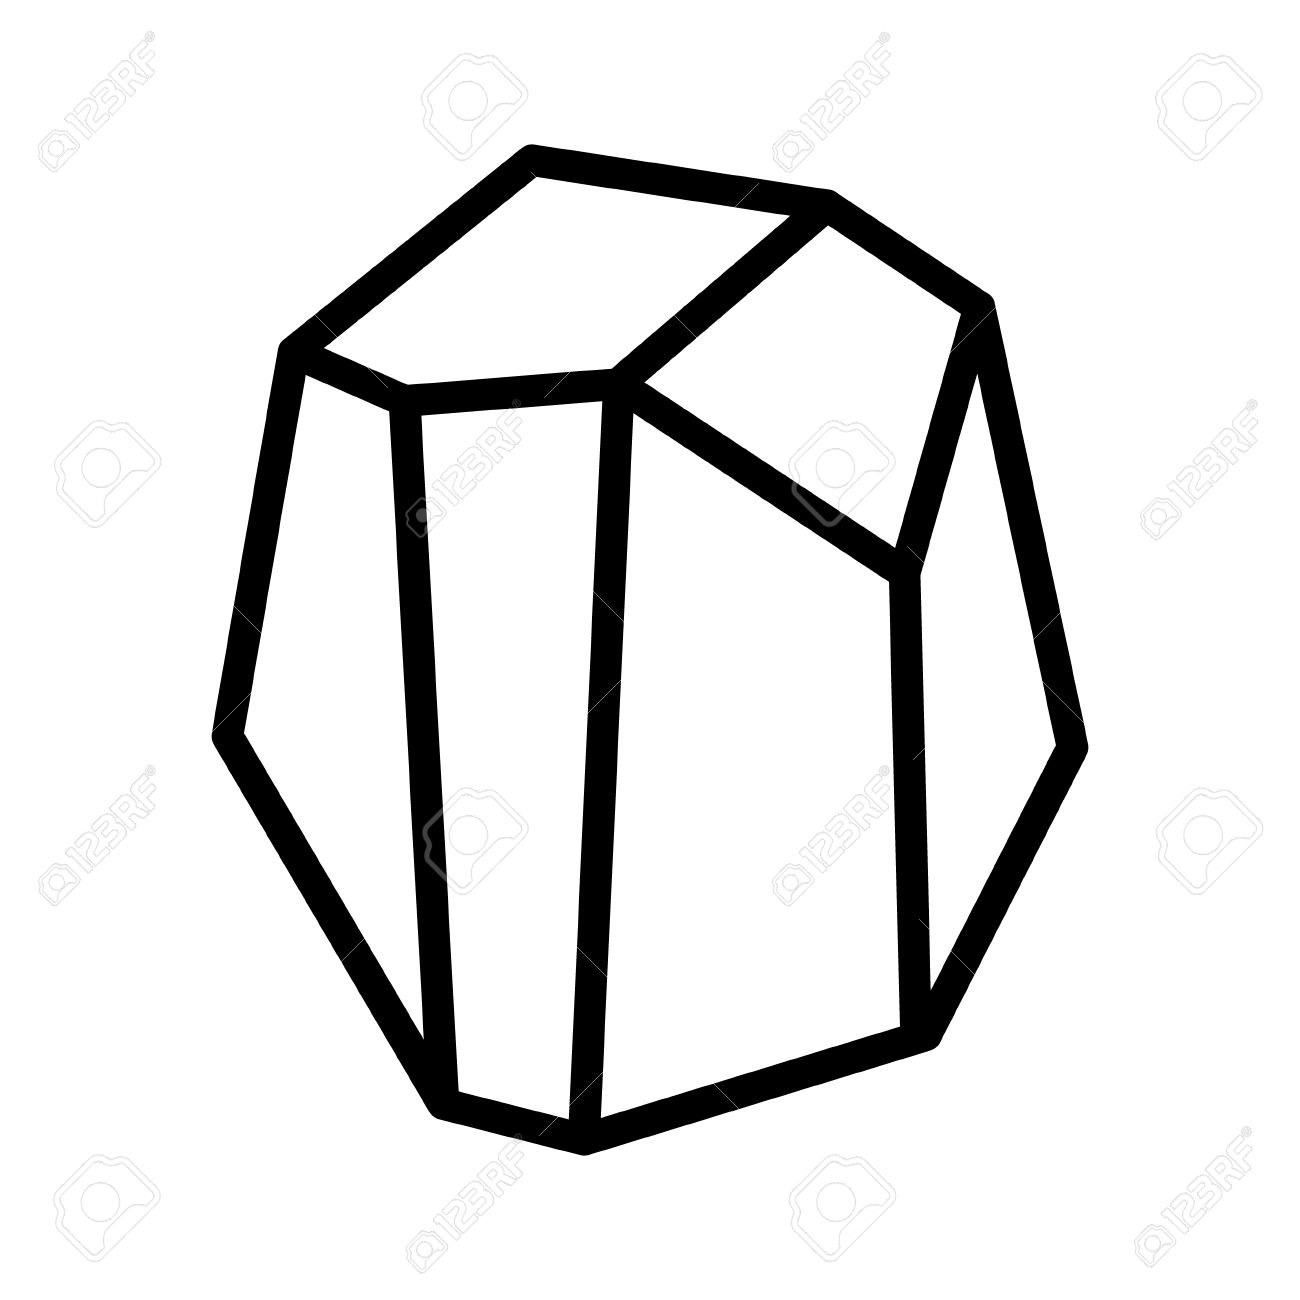 1300x1300 Stone Clipart Mineral Rock